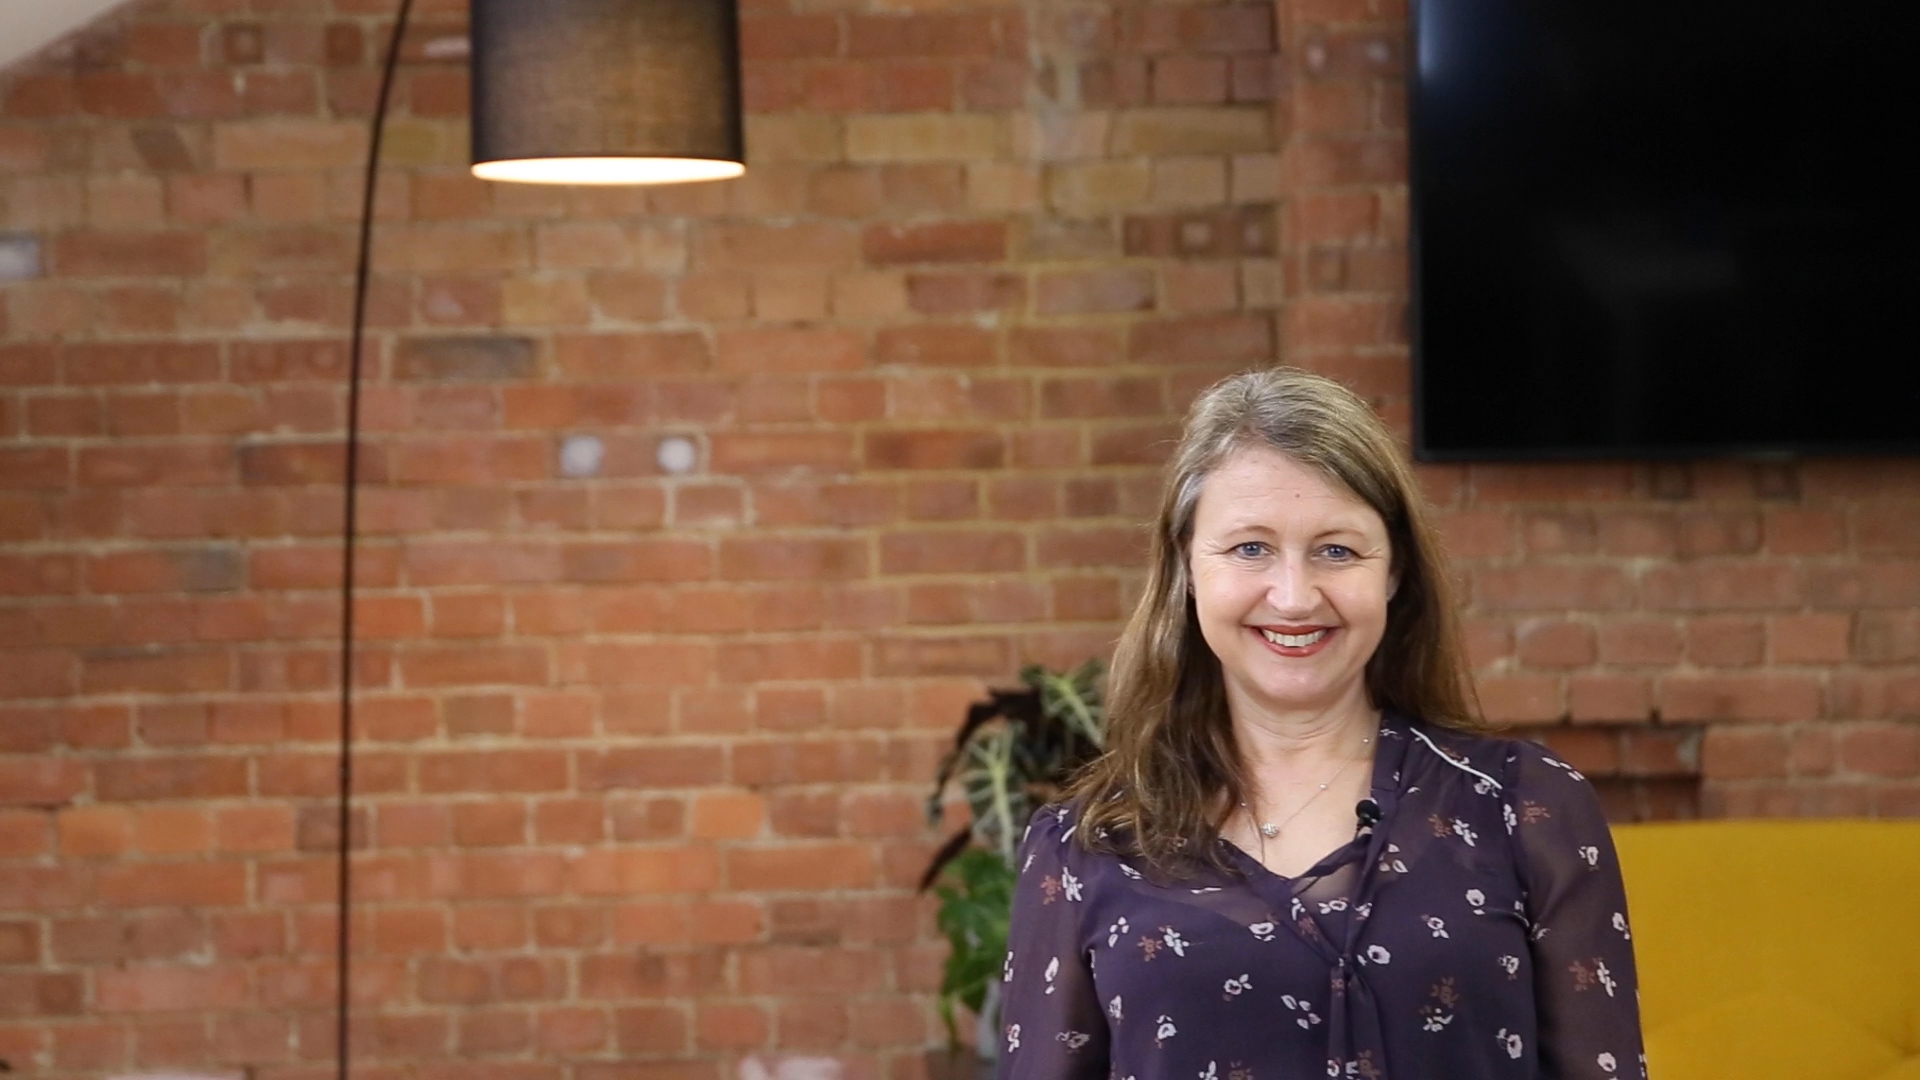 Lara Burns - Chief Digital and Technology Officer at Age UK